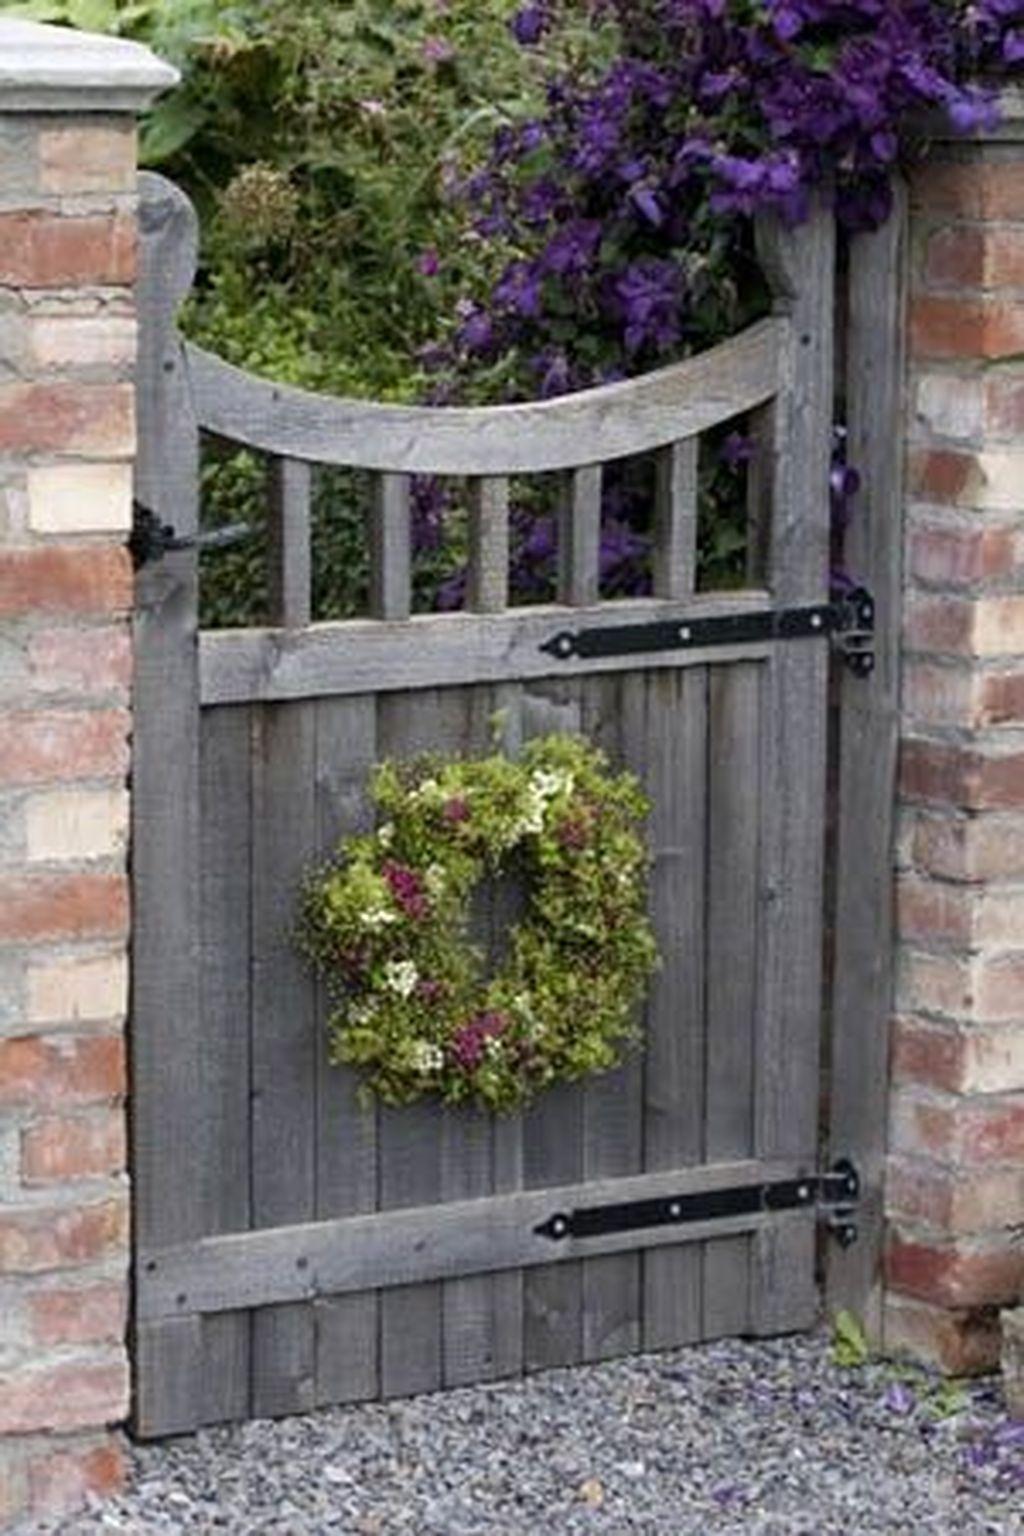 46 Stunning Rustic Garden Gates Ideas Rustic gardens